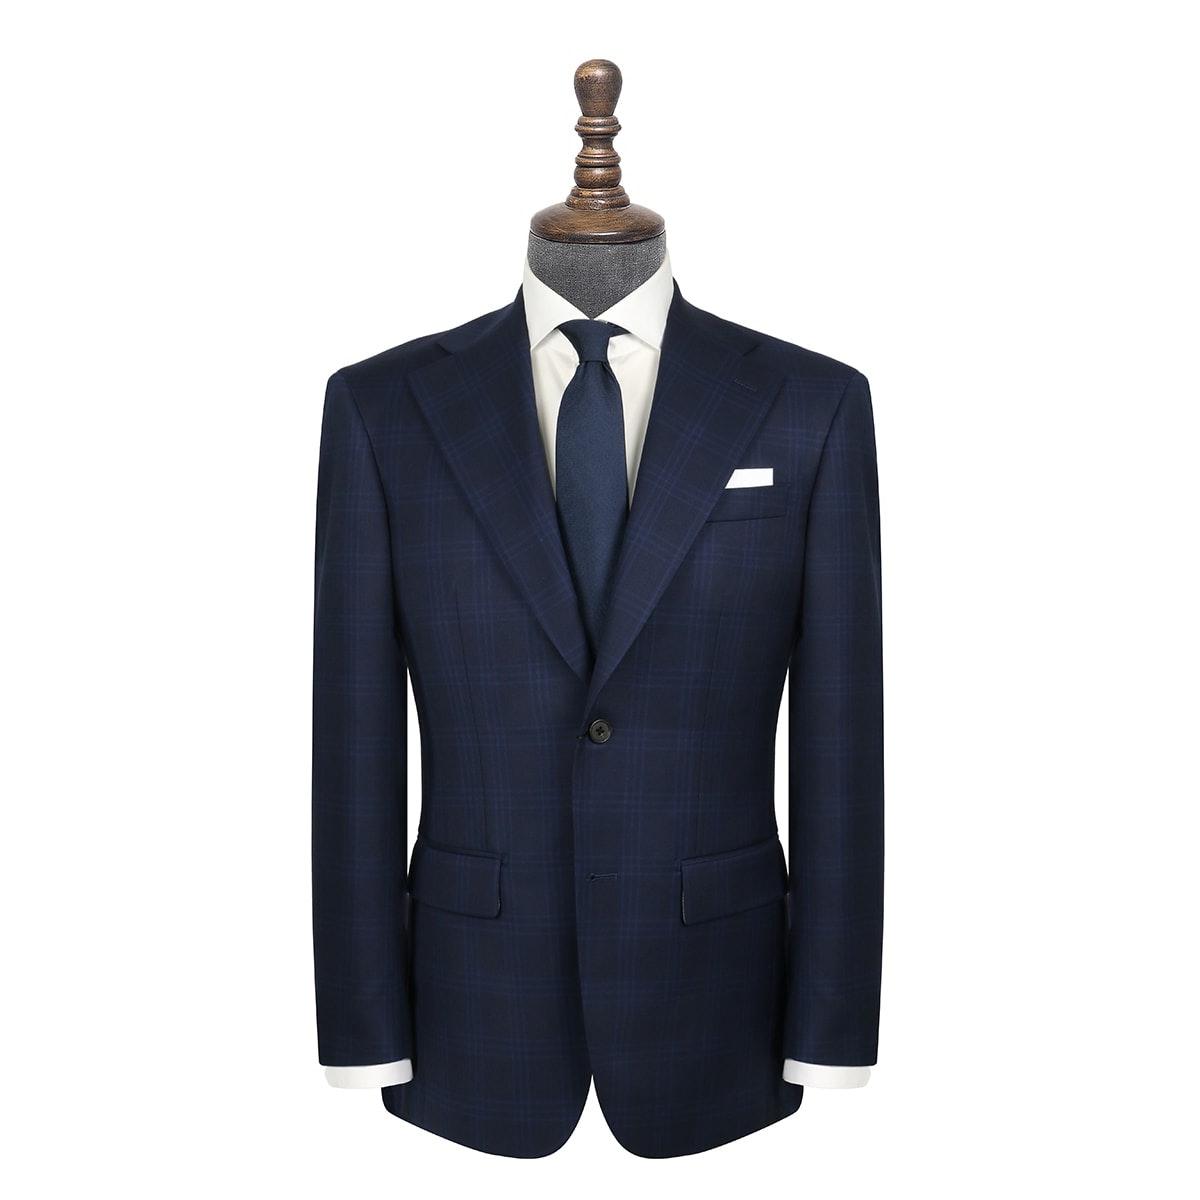 InStitchu Collection Schuman Navy Glen Plaid Jacket